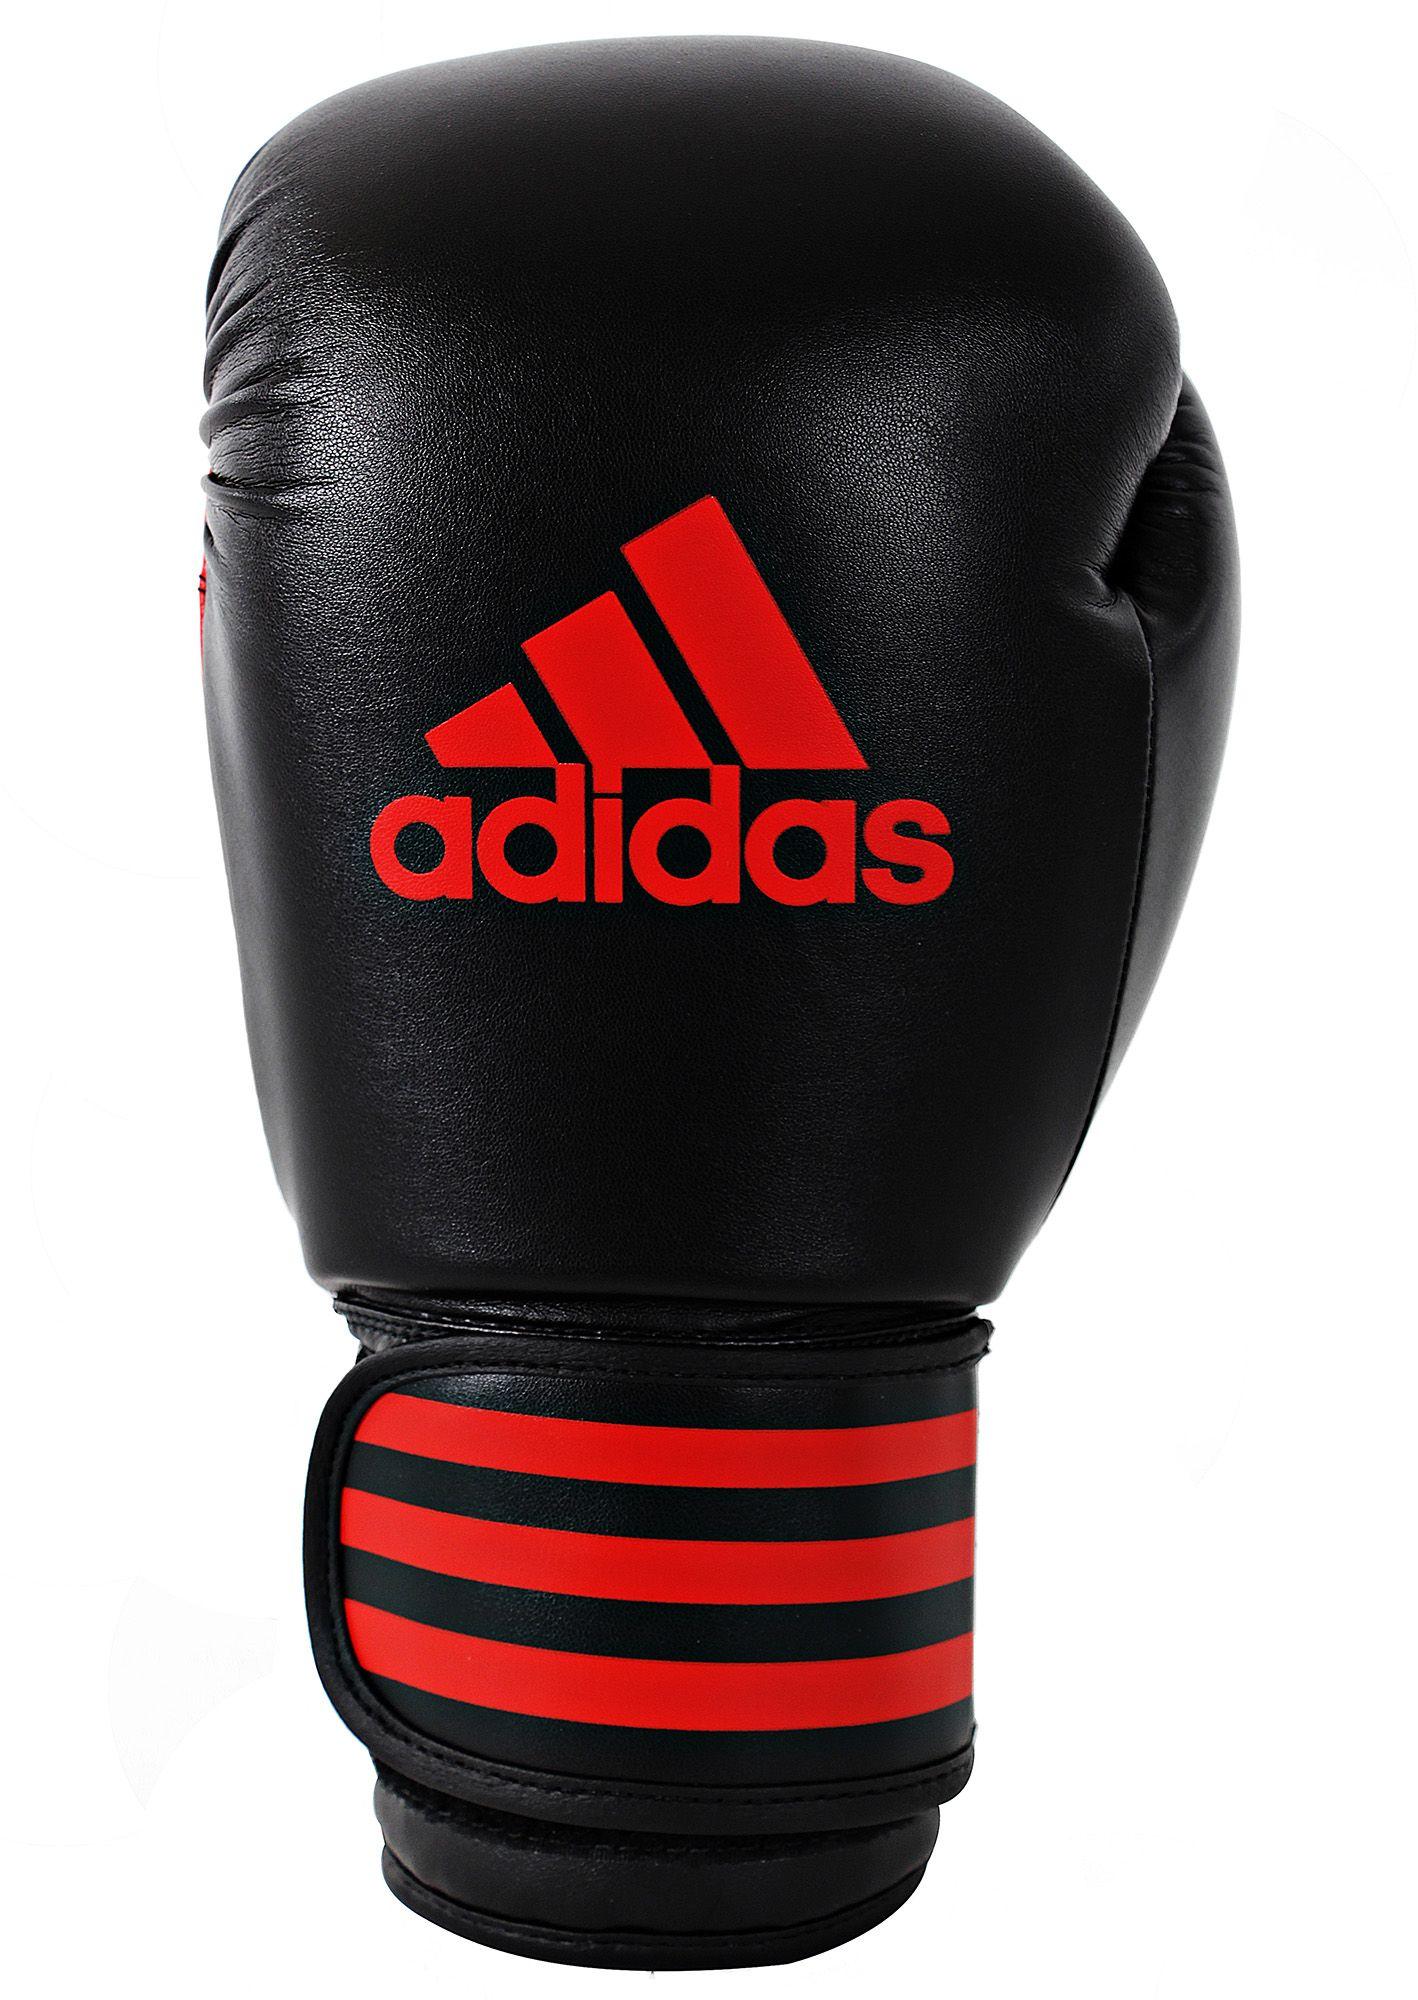 ADIDAS PERFORMANCE adidas Performance Boxhandschuhe, »Power 100«